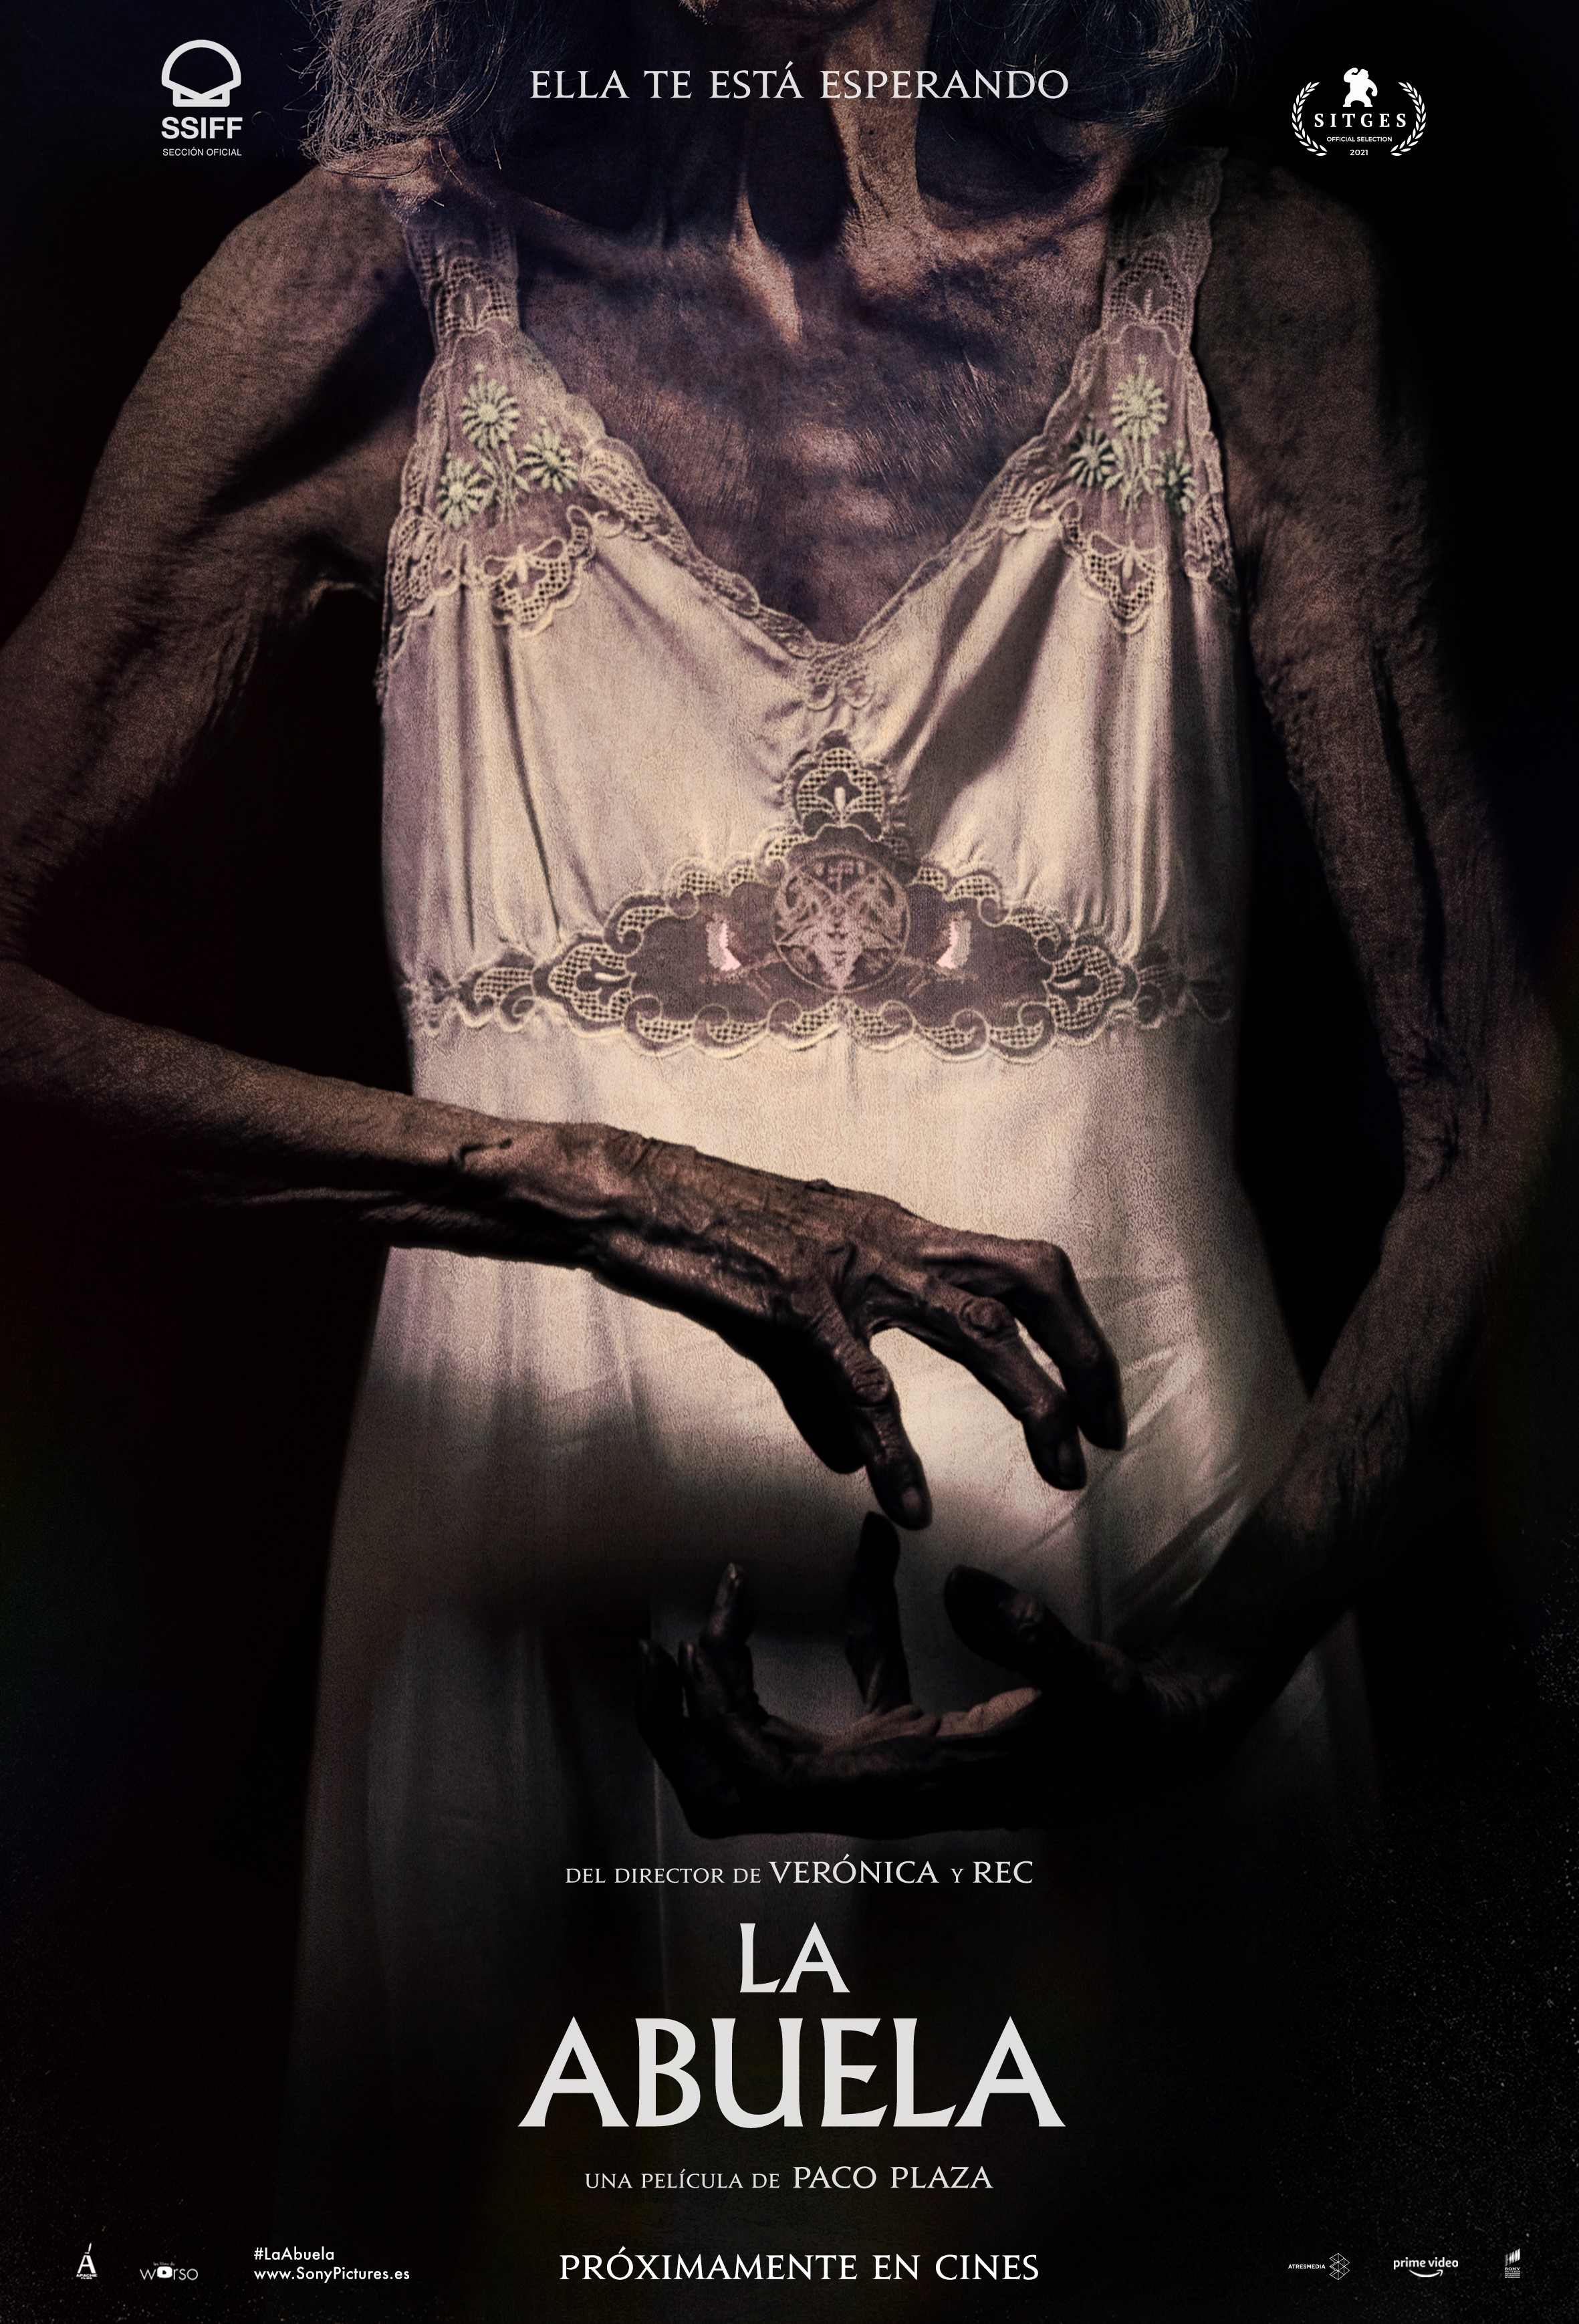 LA ABUELA [The Grandmother]